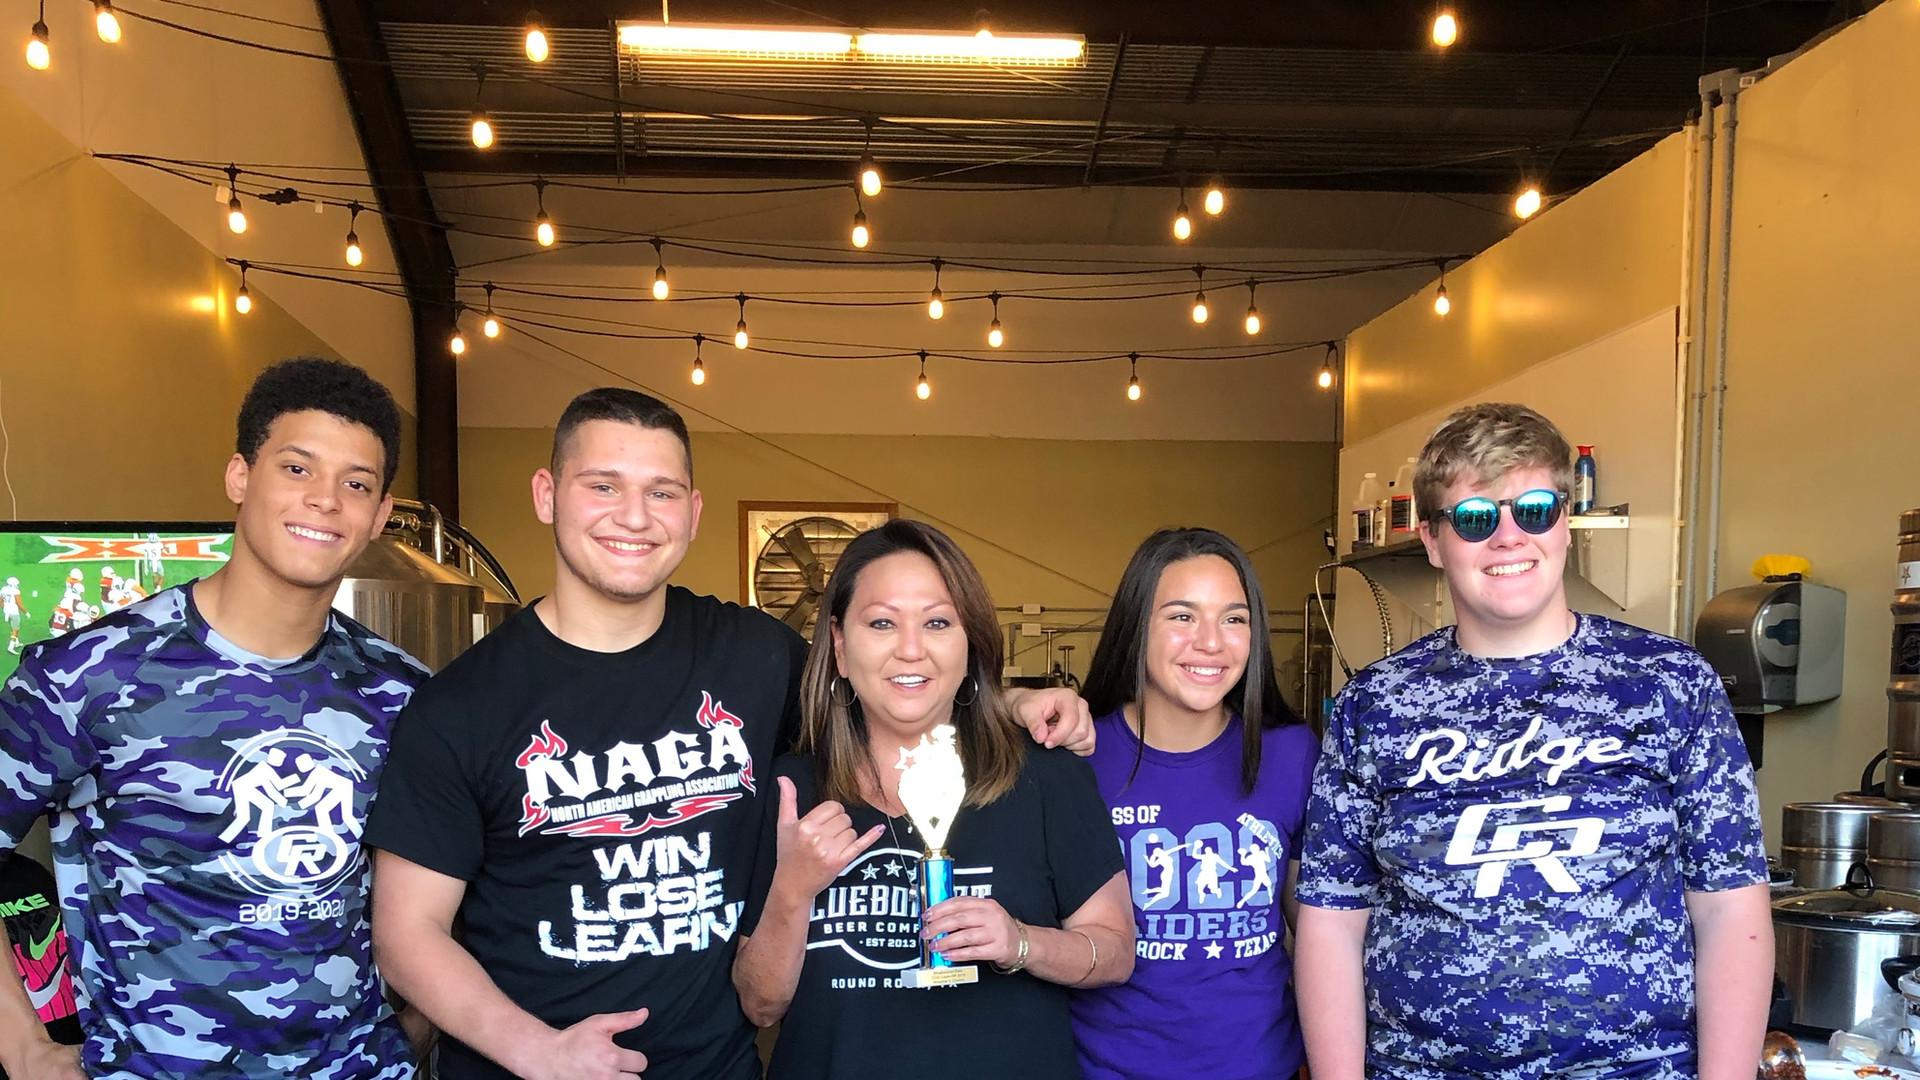 The Cedar Ridge High School Wrestling Team